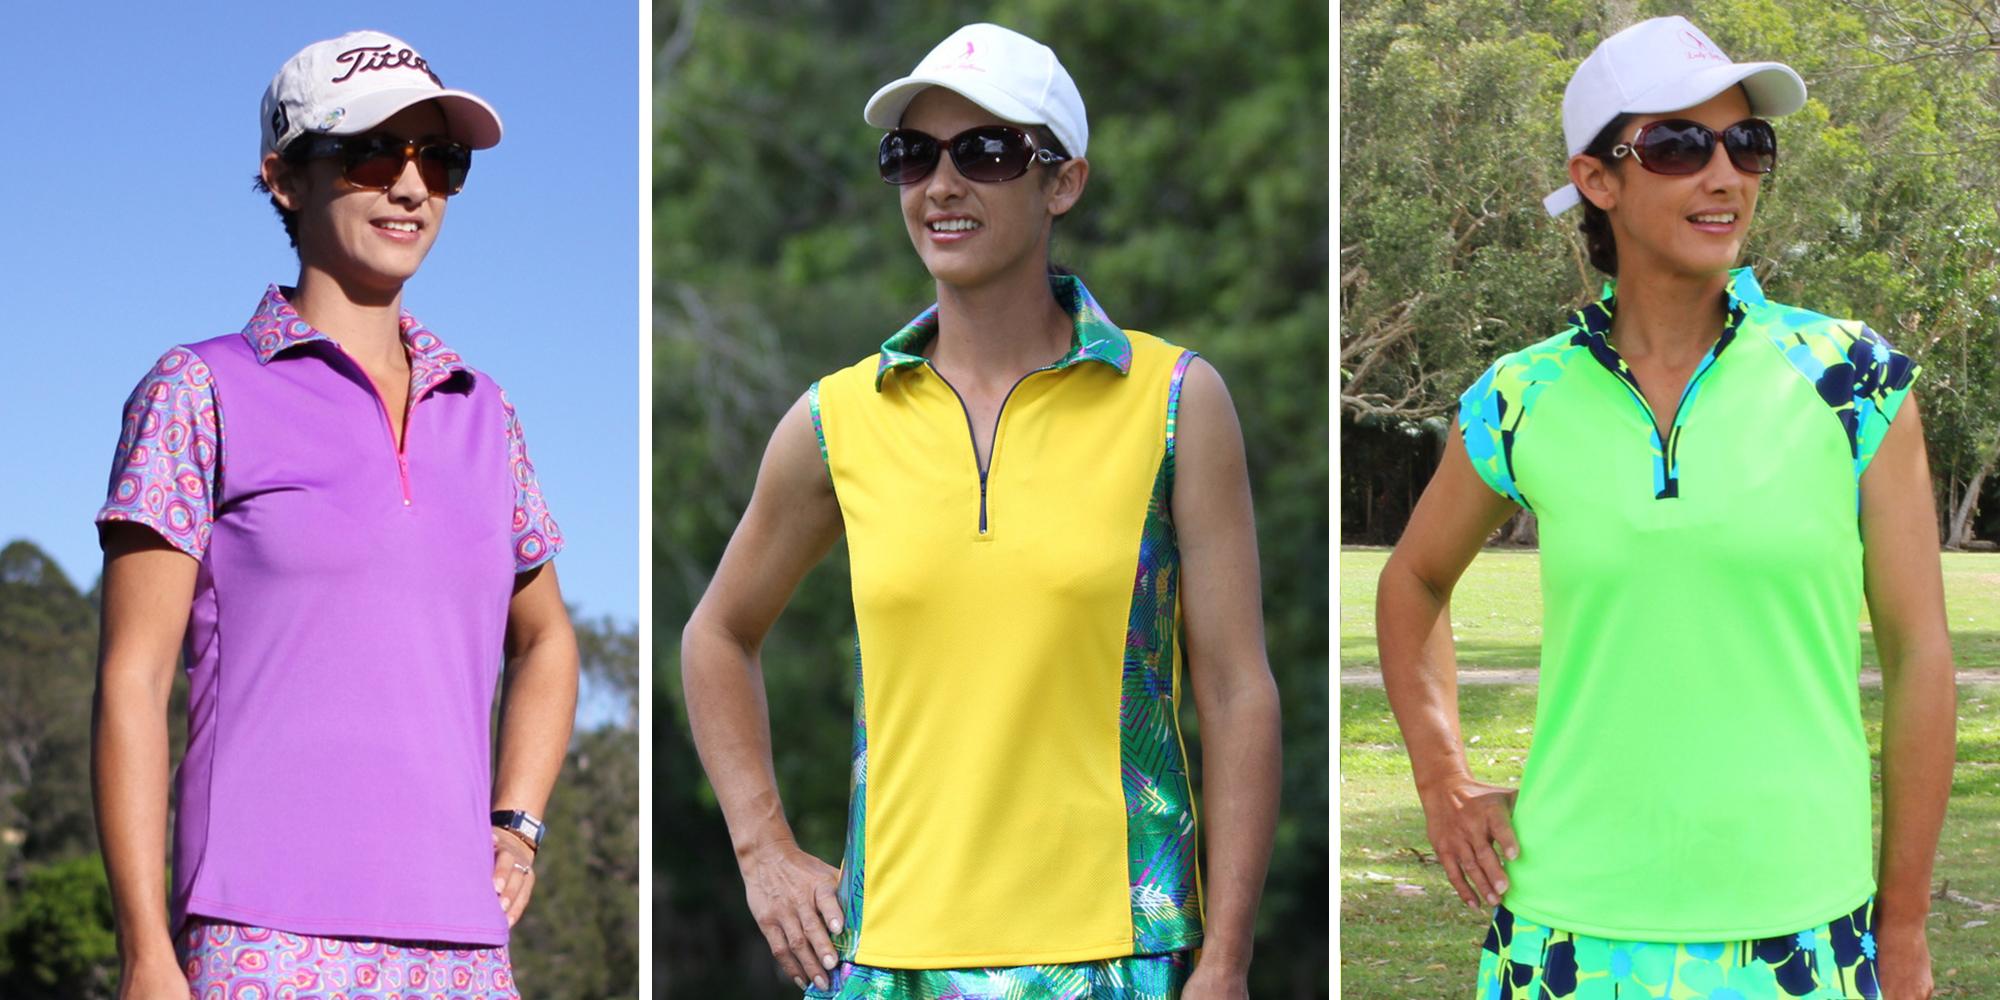 ladies-golf-shirts-in-cap-sleeves-website-about-banner-2020.jpg